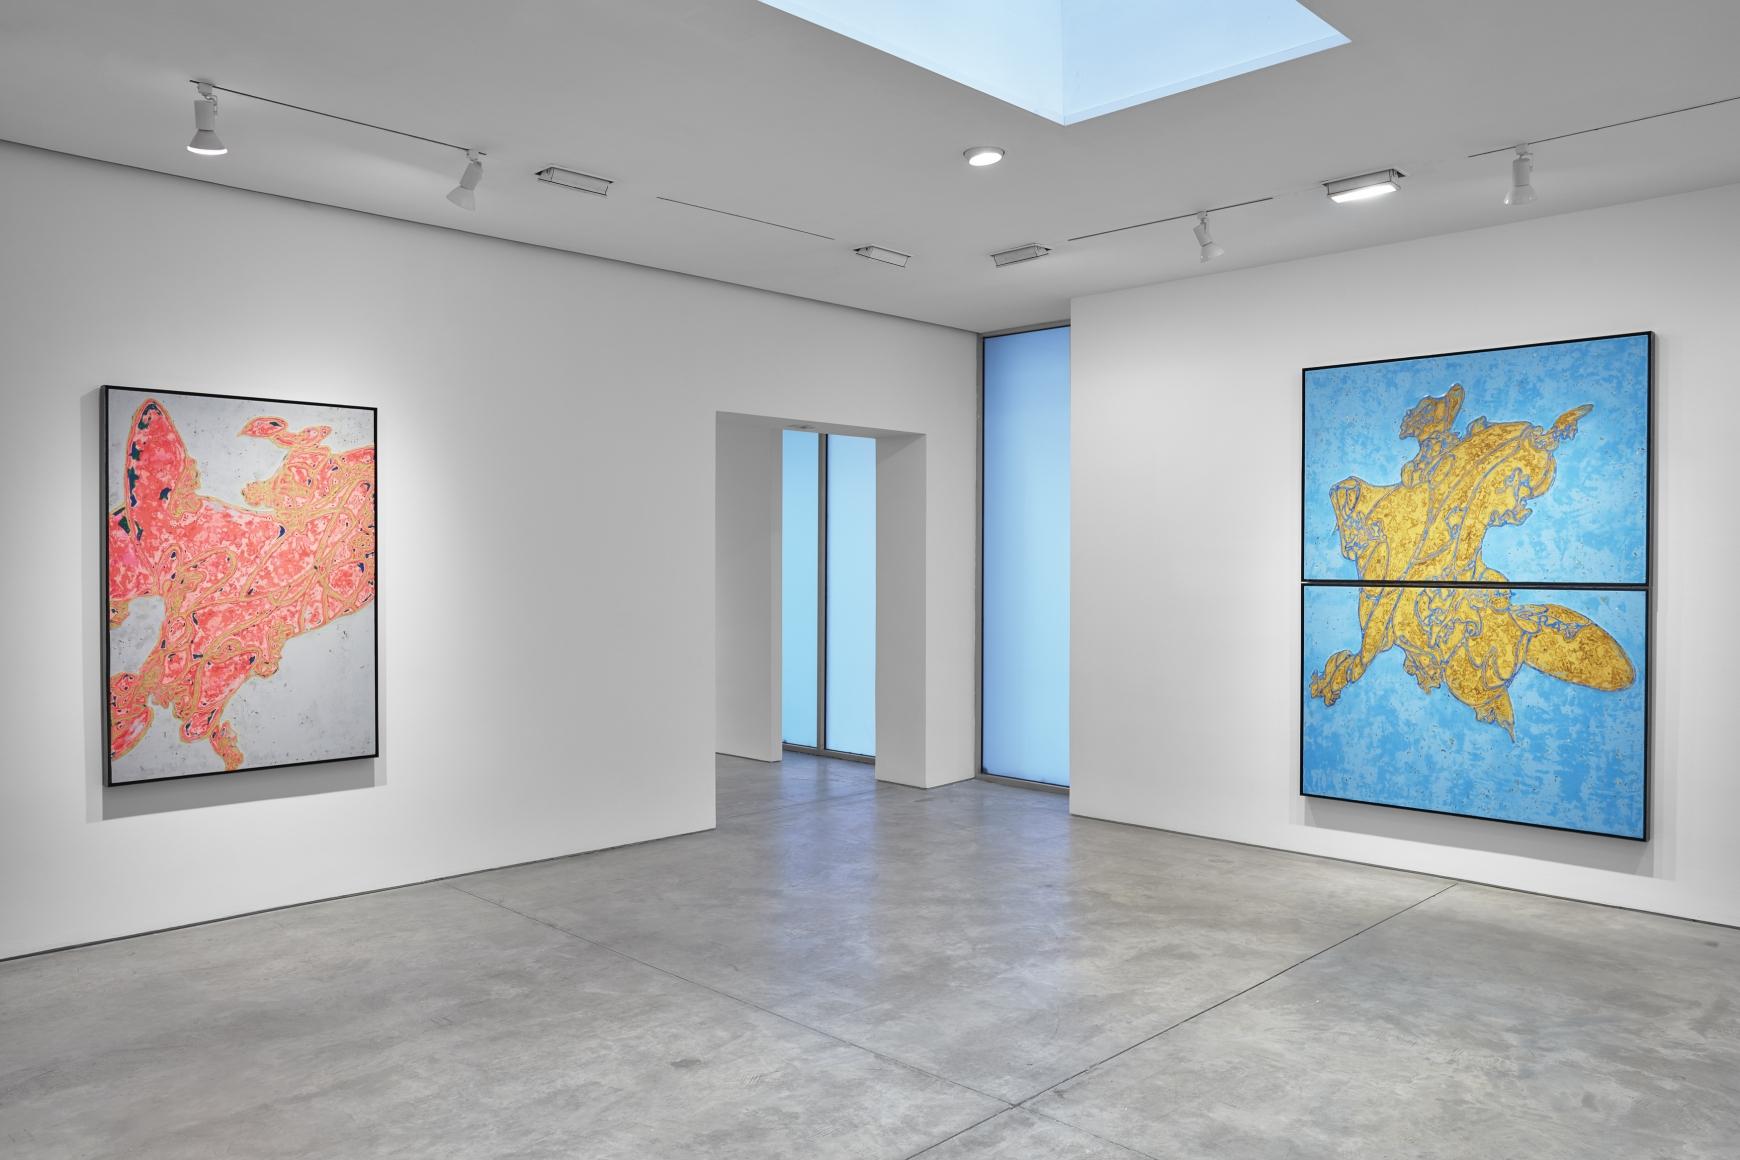 Lee Bul, Interlude: Perdu Installation view 5